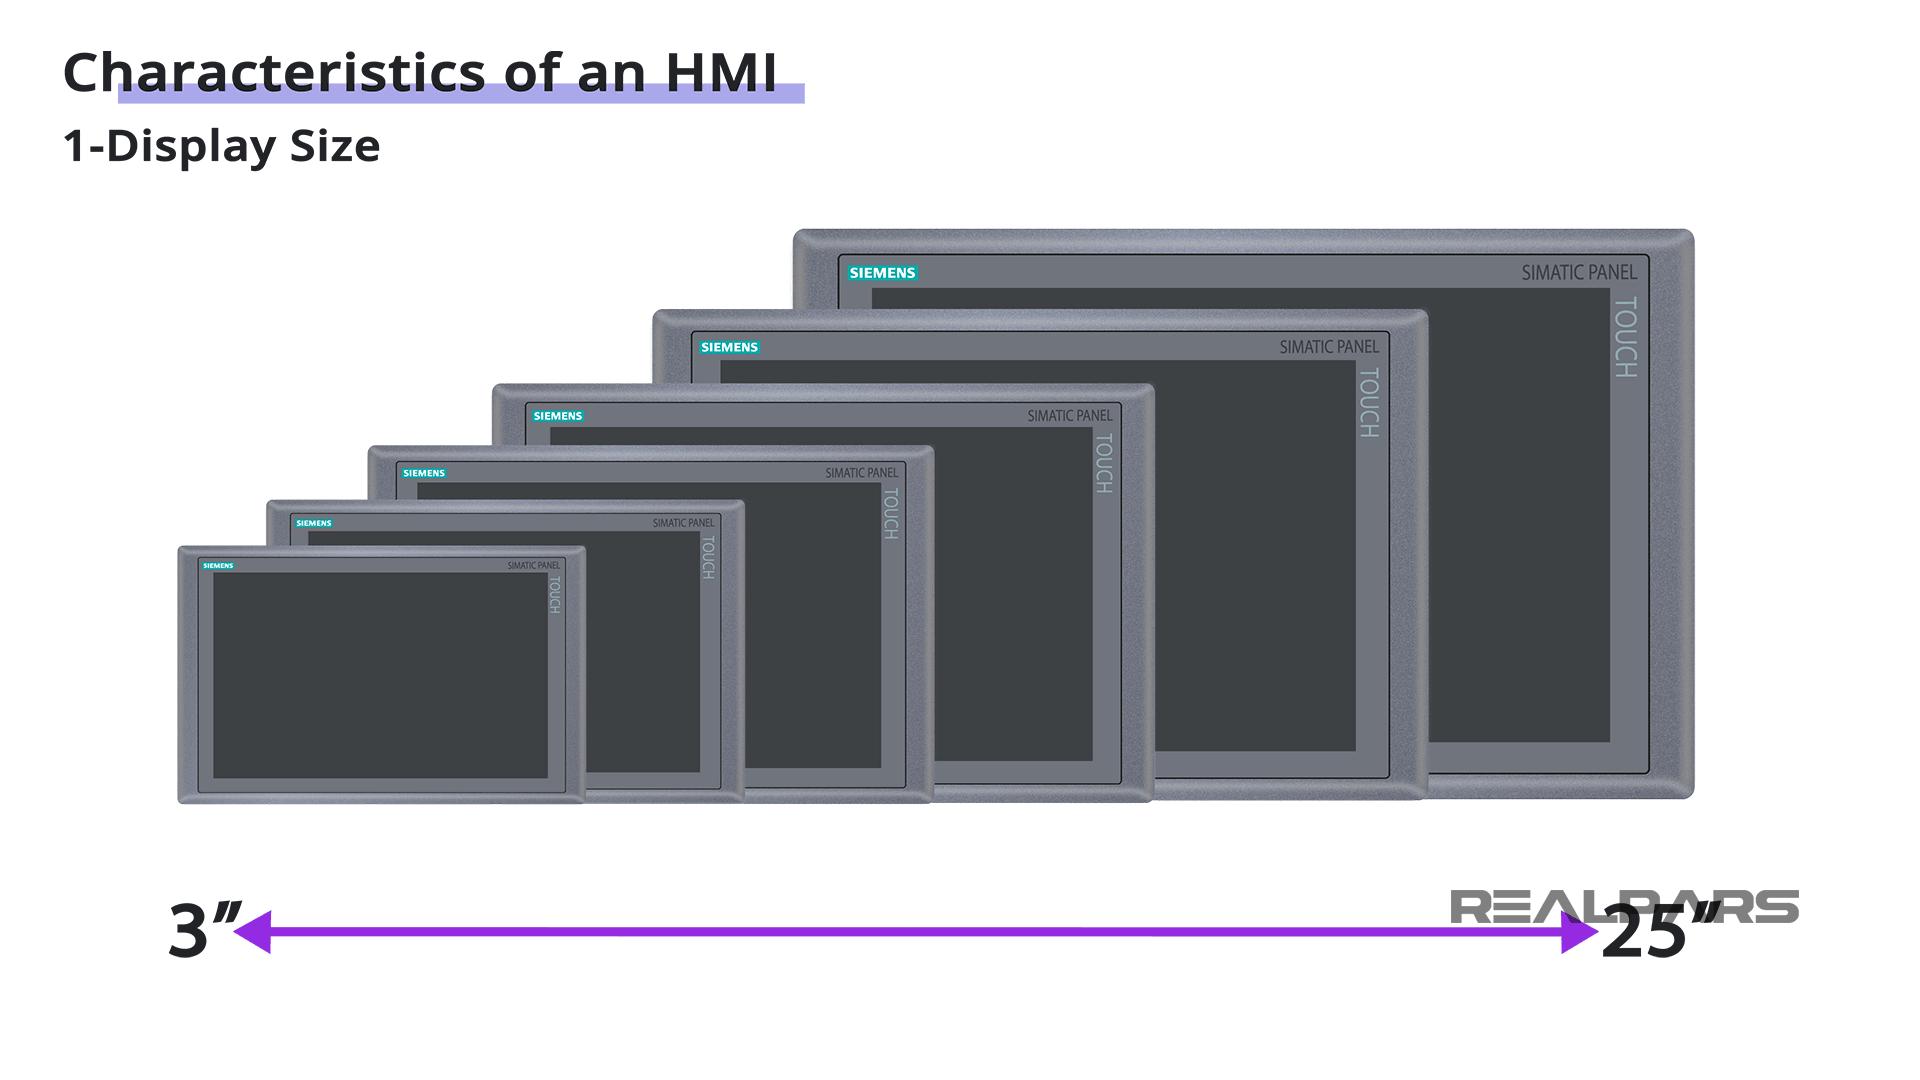 HMI Panel Display Size